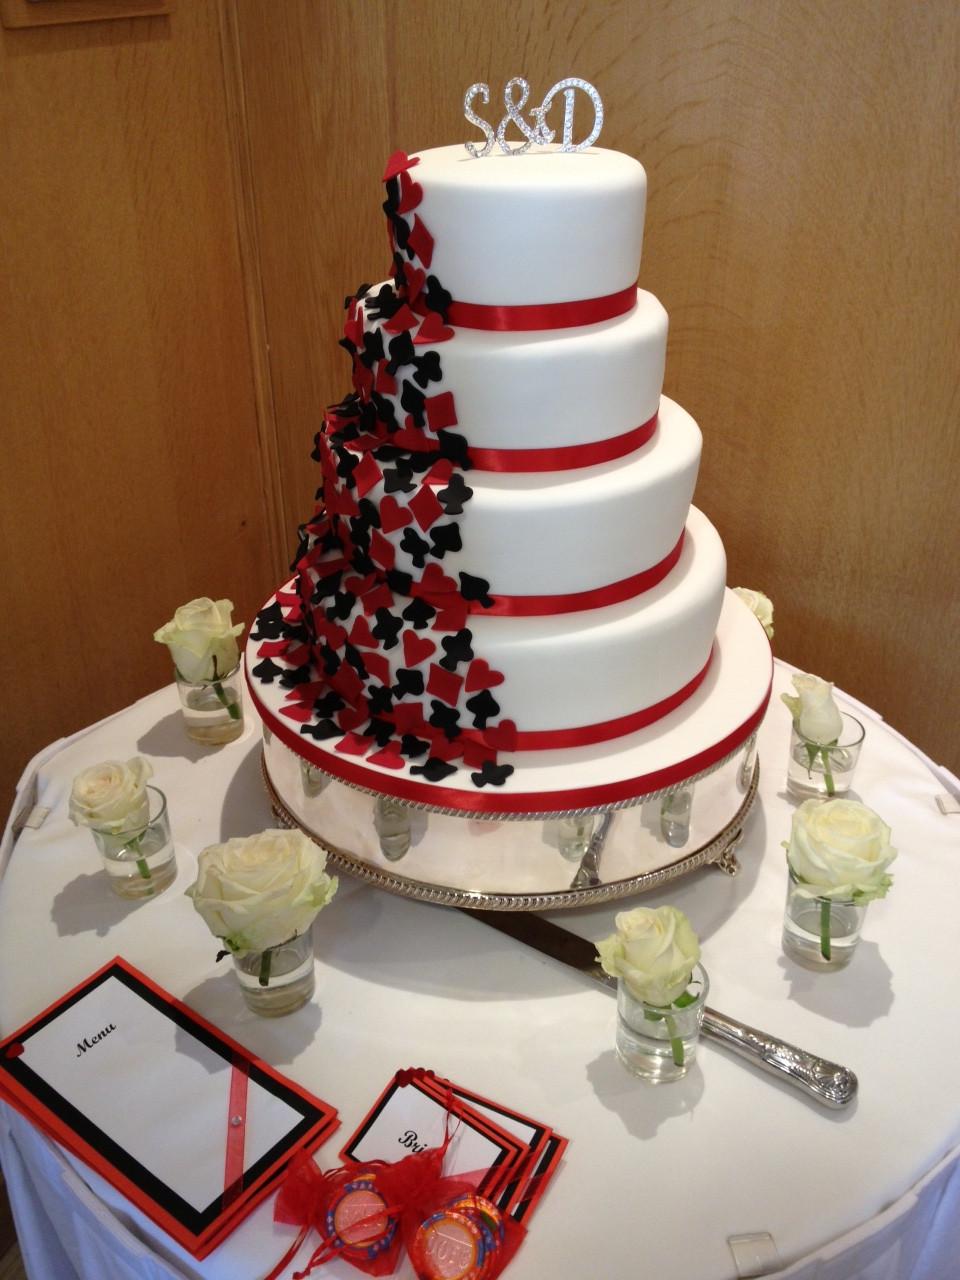 Wedding Cakes Las Vegas  Wedding cakes in vegas idea in 2017